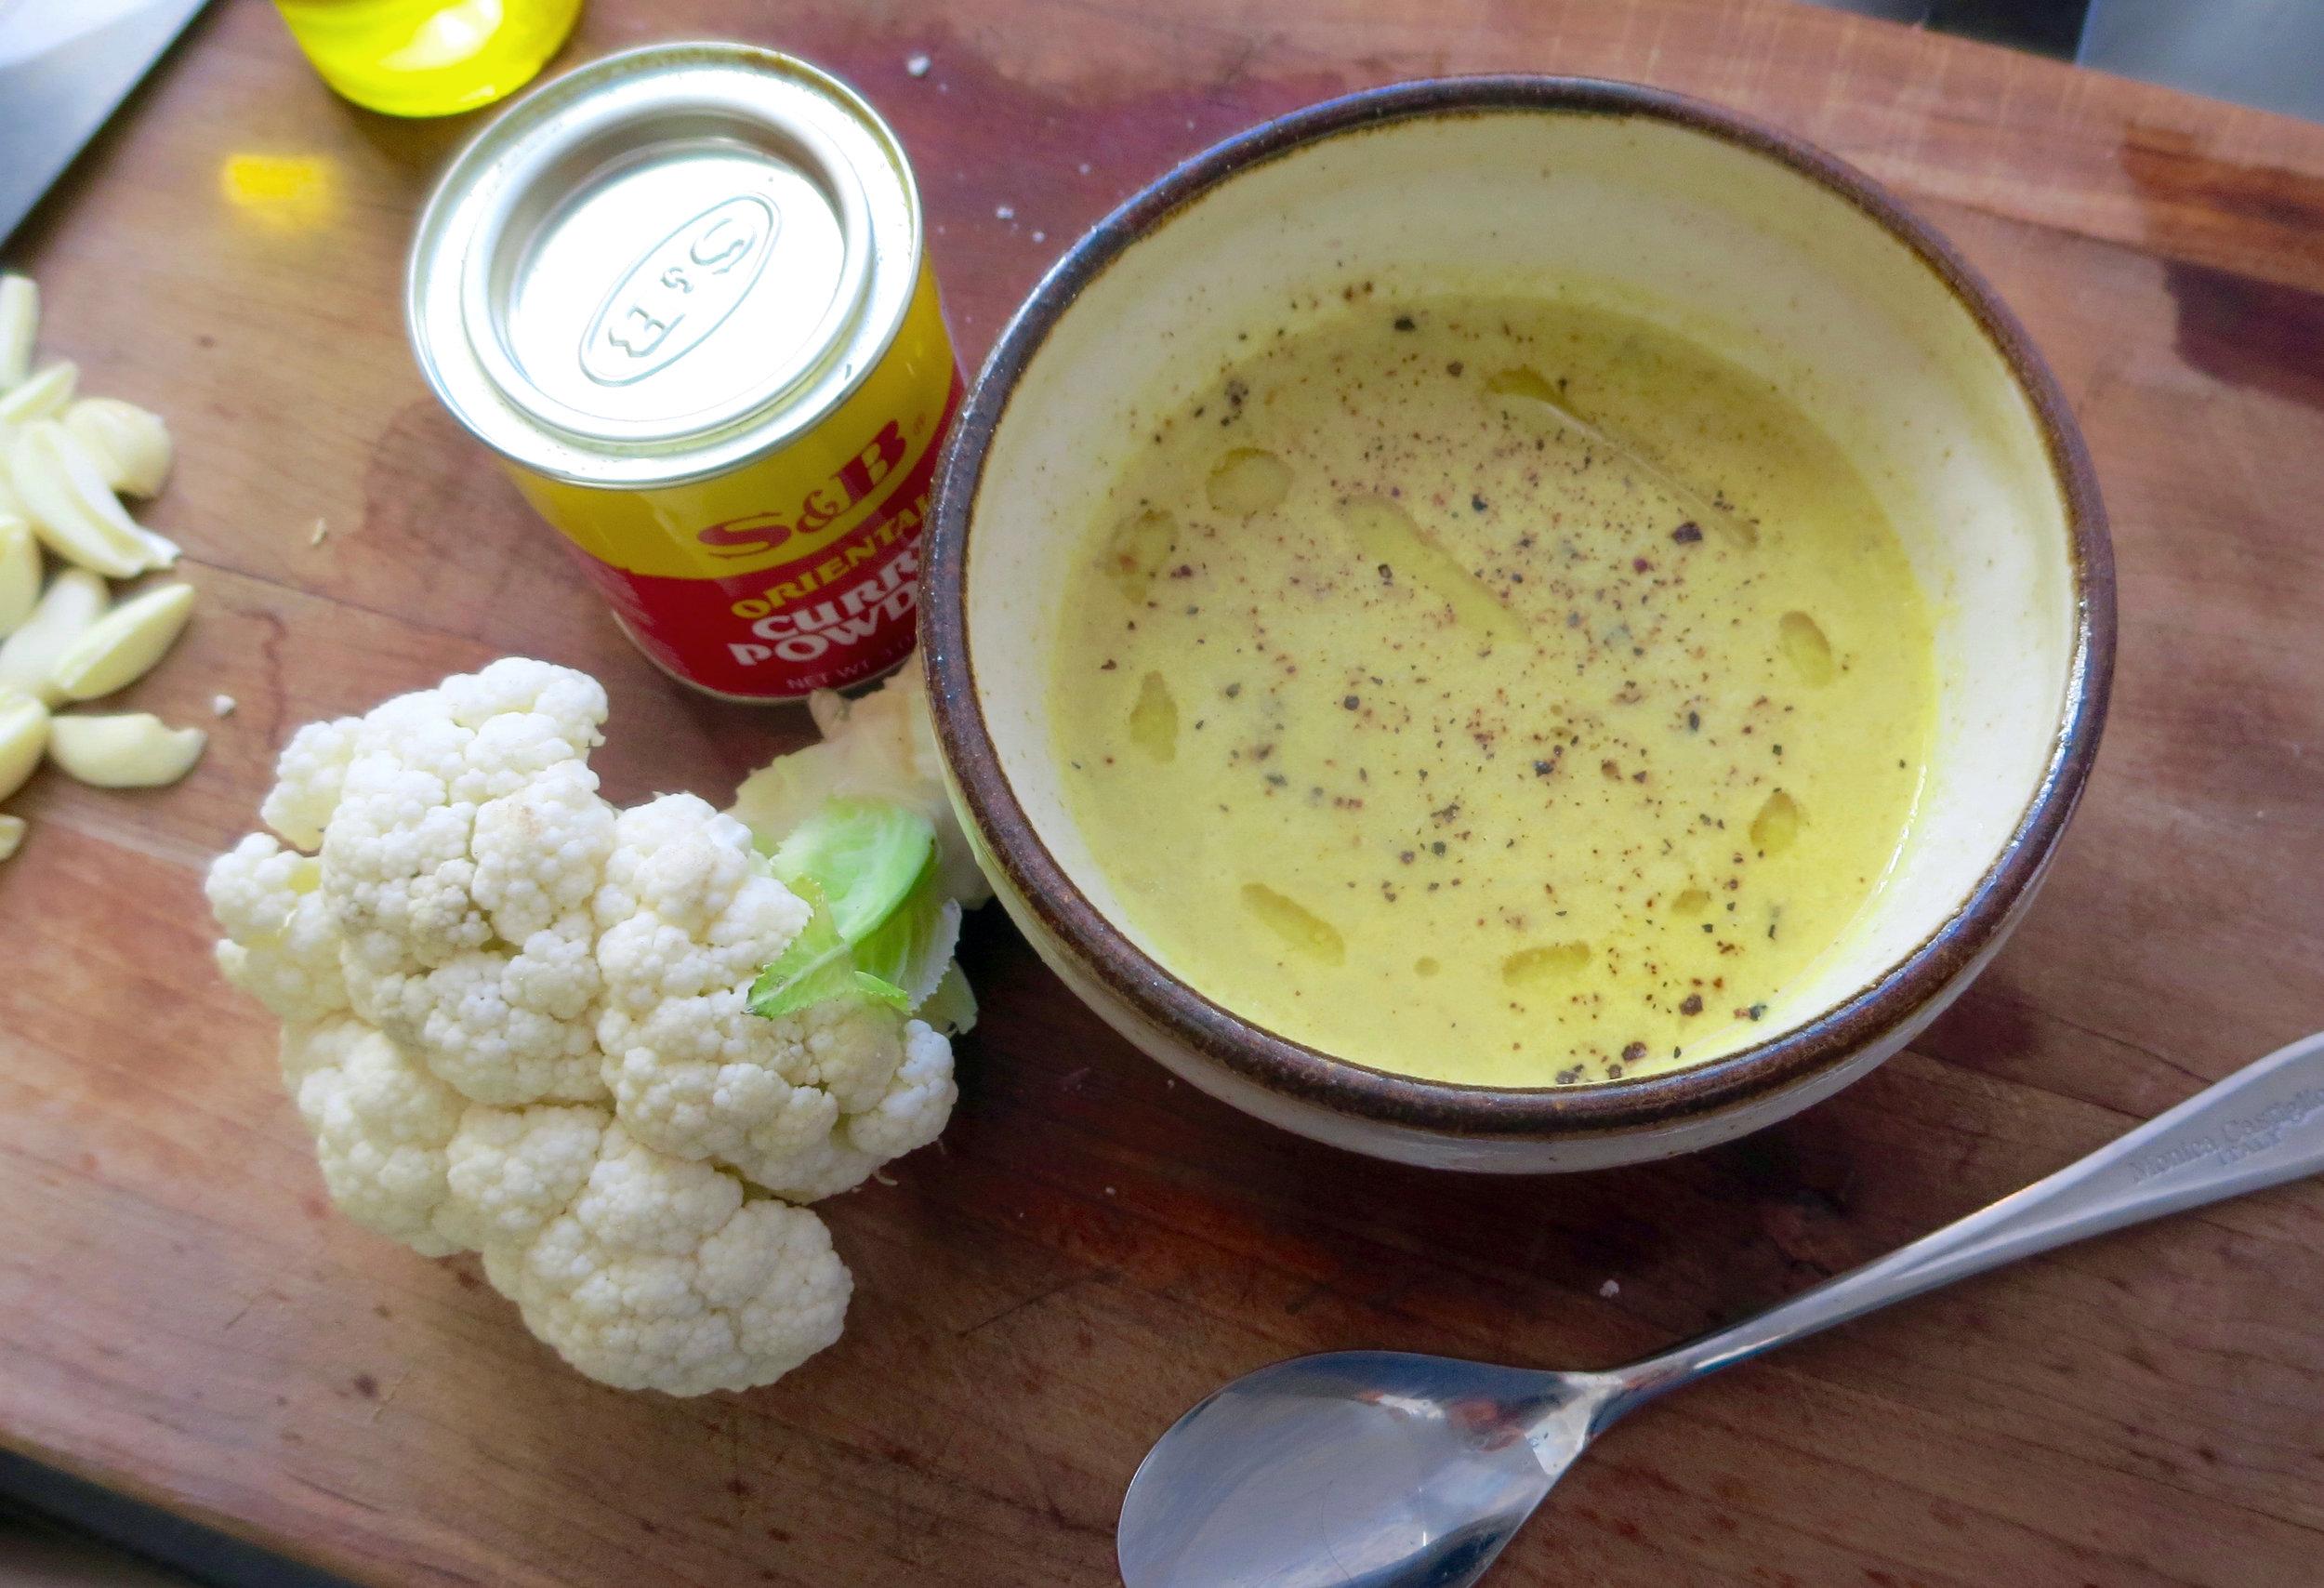 culiflower_curry_soup.jpg